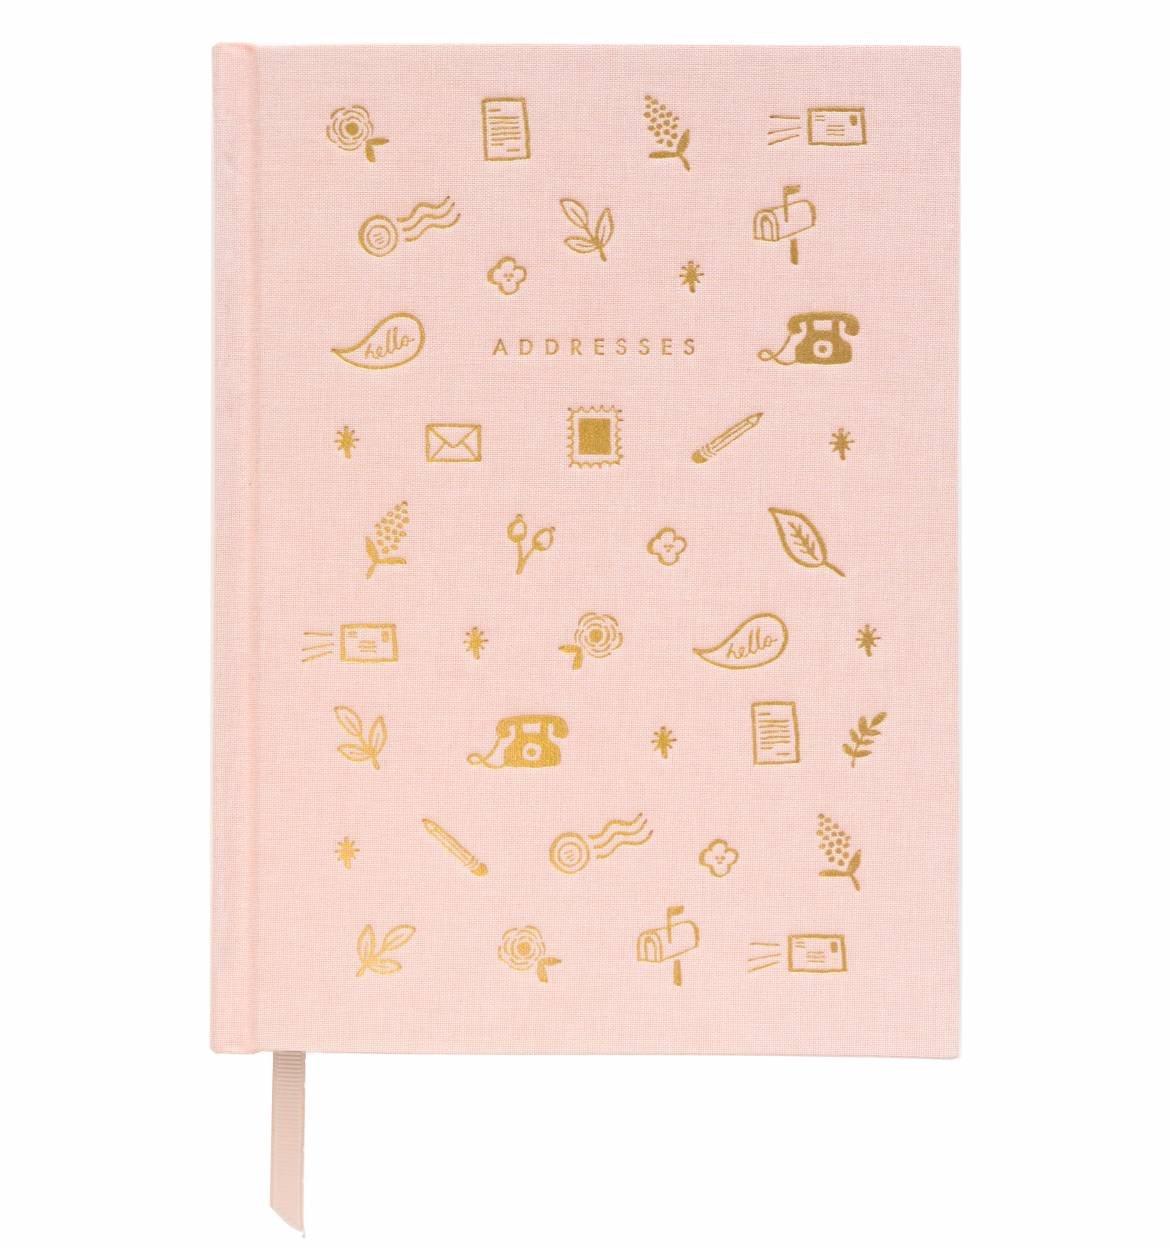 Rifle Paper Co Address Book Keepsake - Blush